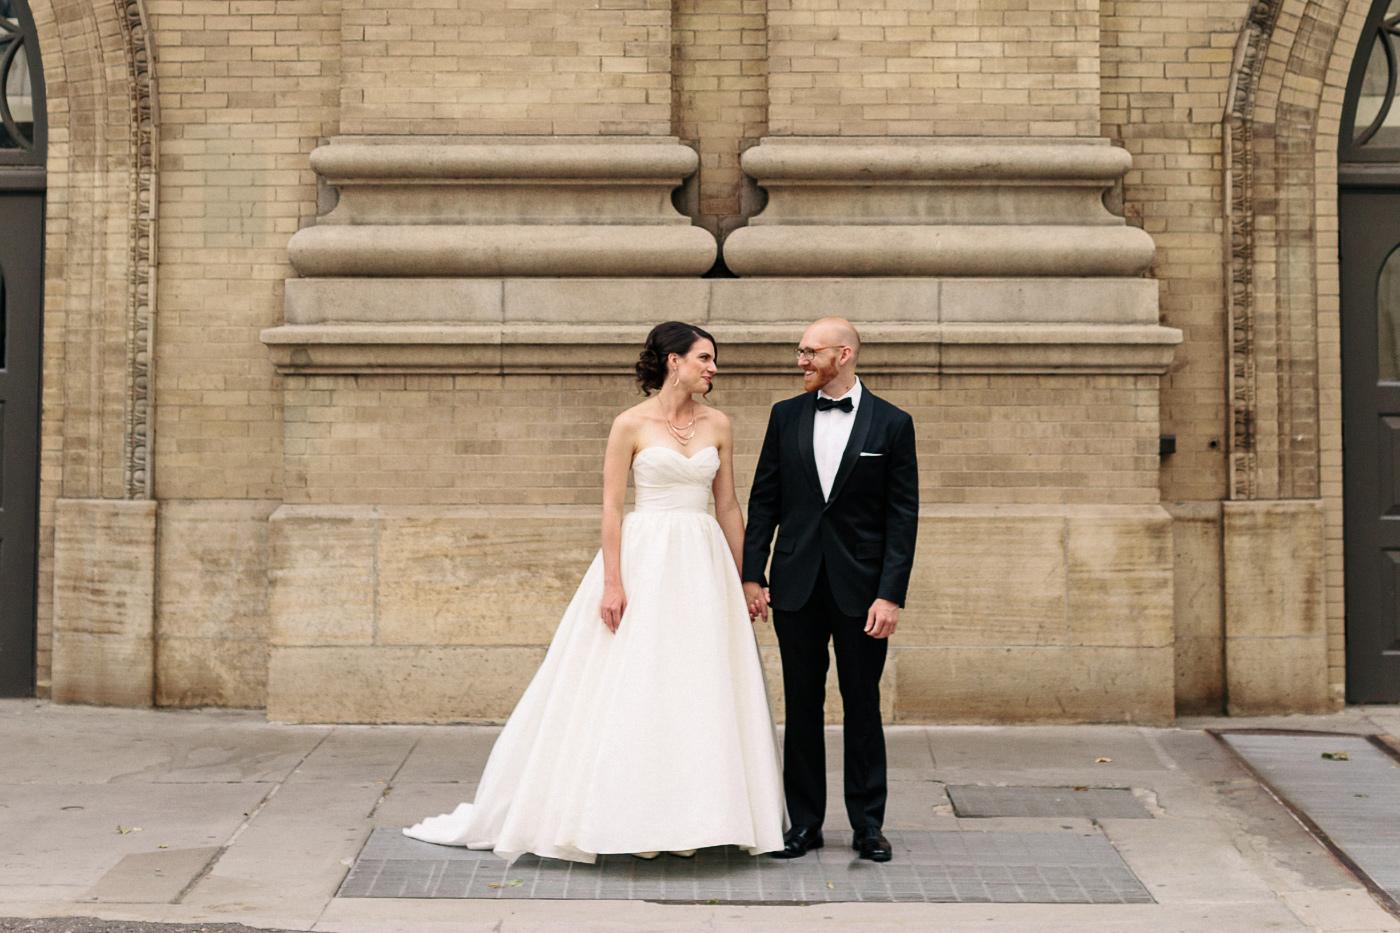 161-istanbul-wedding-photographer.jpg